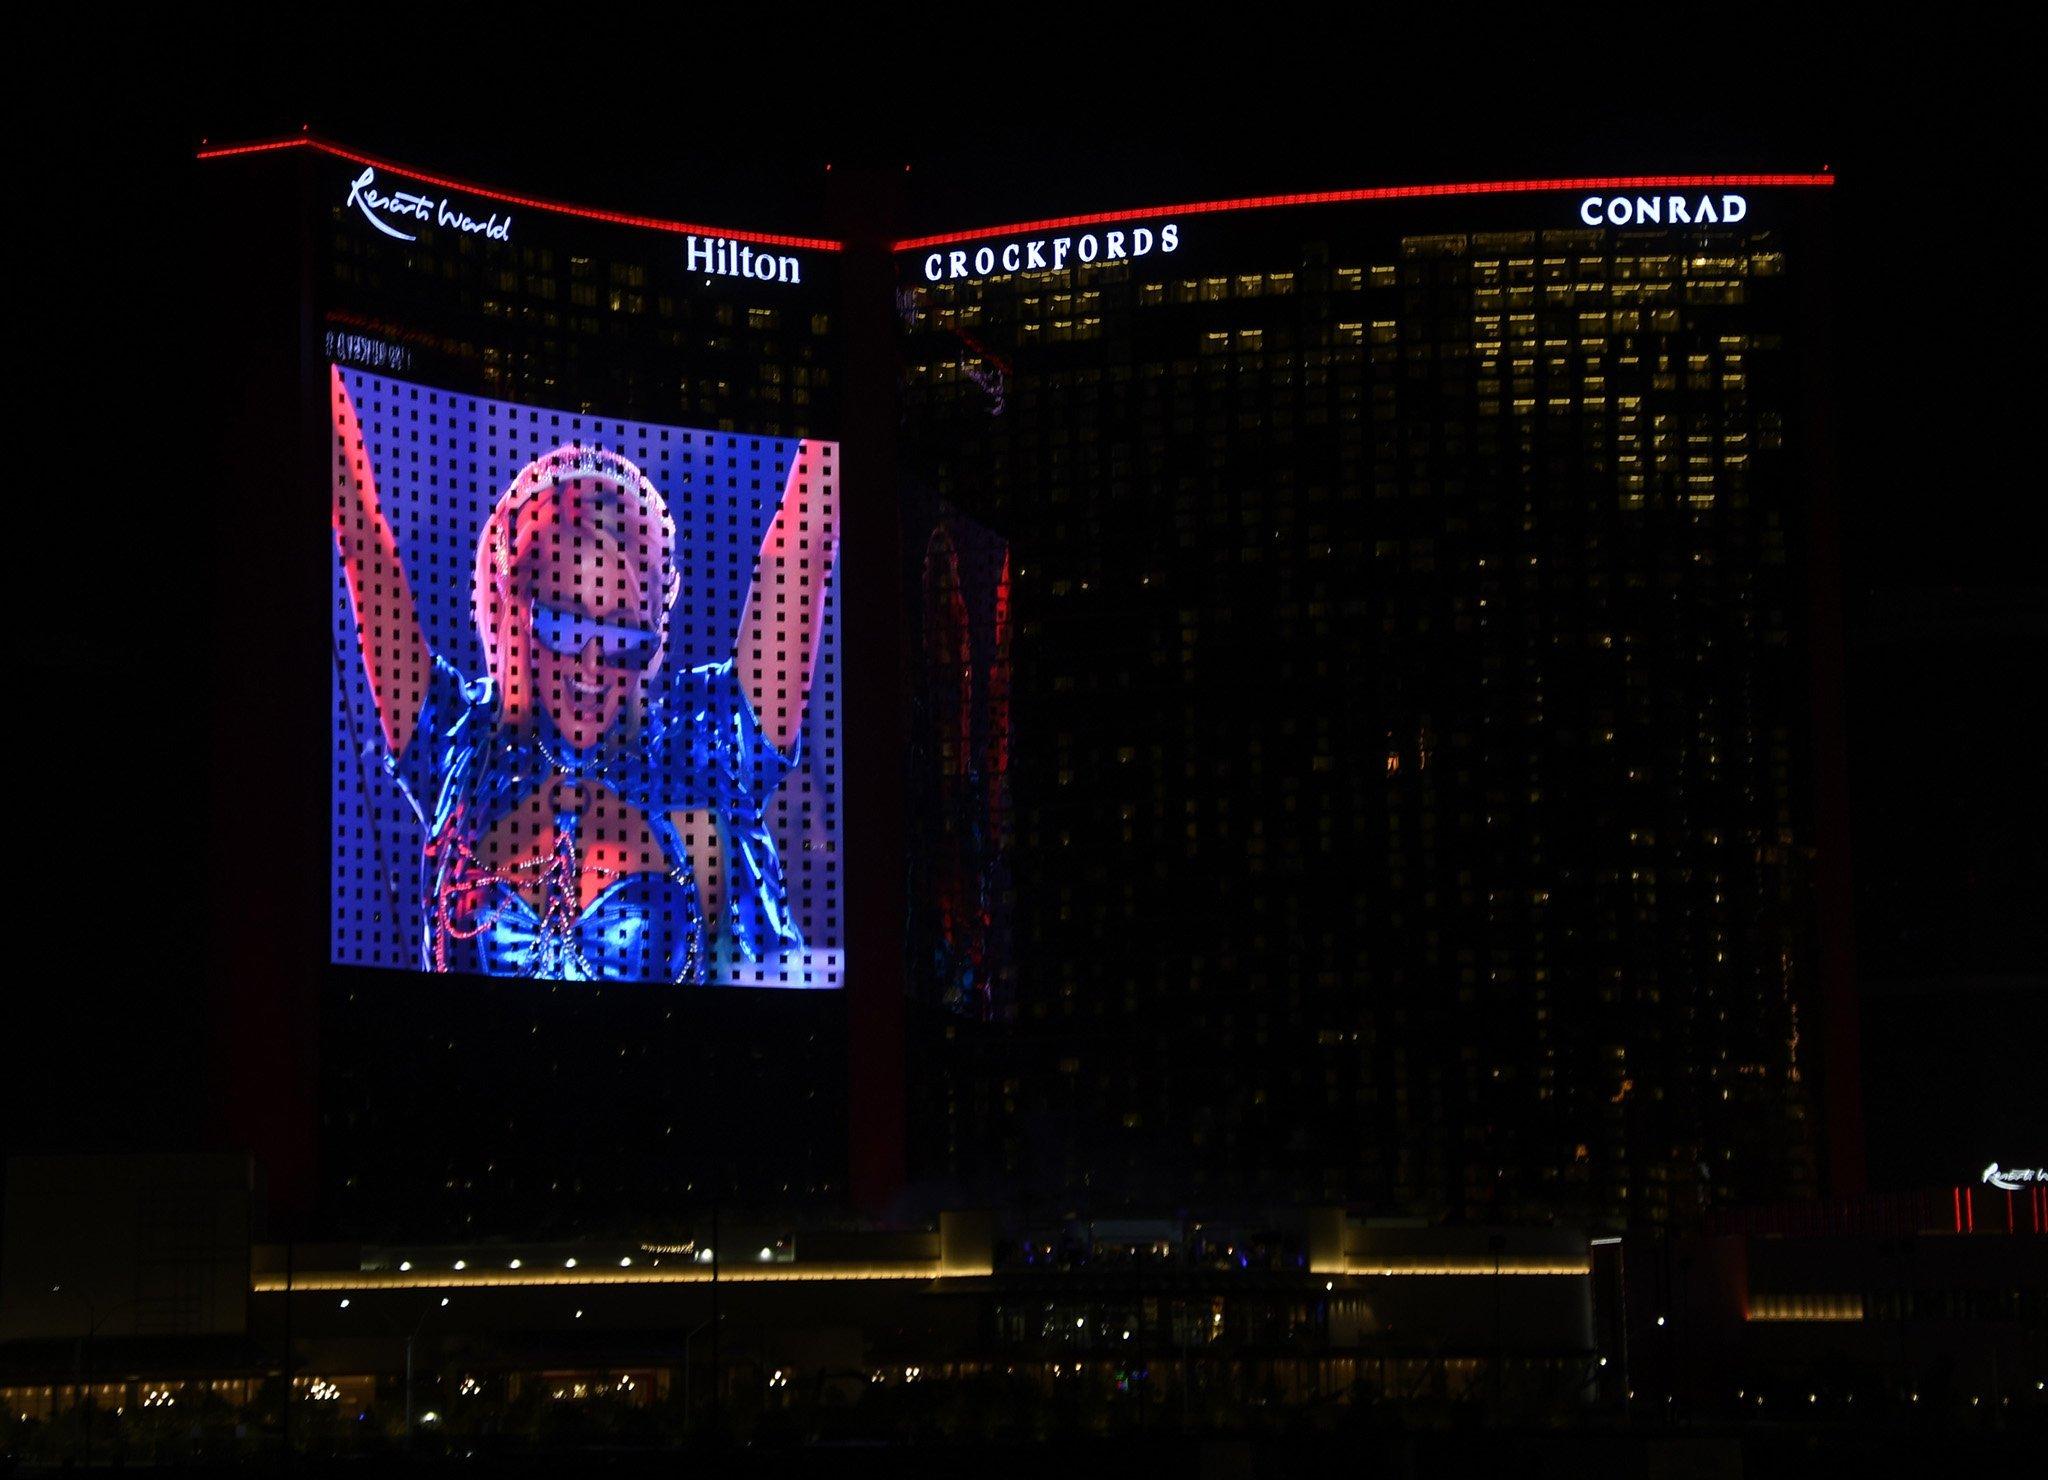 Paris Hilton is seen DJing on the big screen display during the grand opening of Hilton Resorts World Las Vegas on June 24, 2021